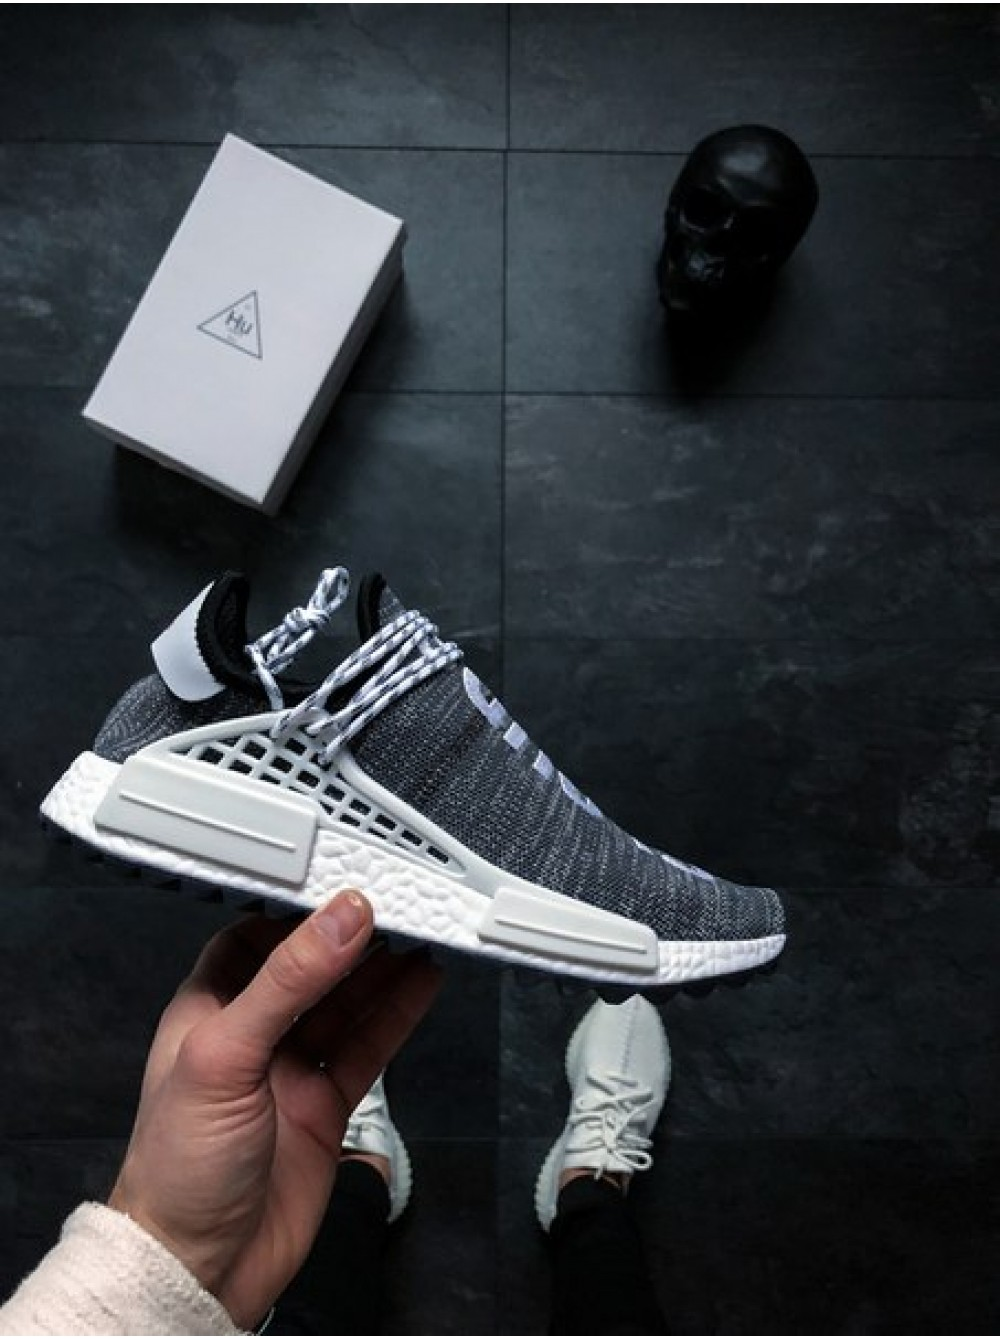 sports shoes e31f1 1dbad Кроссовки Adidas Human Race NMD x Pharrell Williams «Oreo»